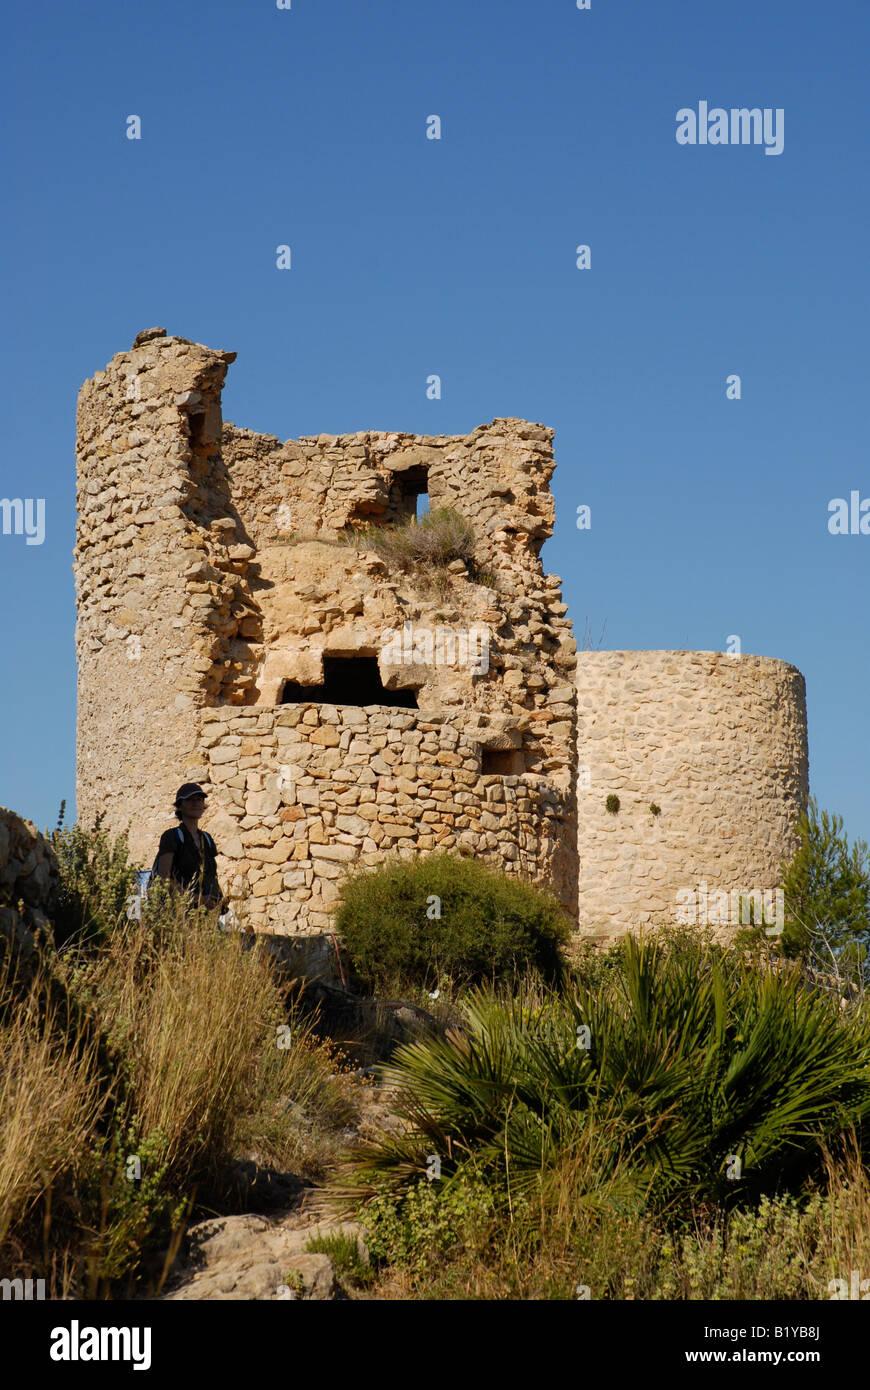 Spanish building blocks stock photos spanish building blocks stock images alamy - Stock uno alicante ...